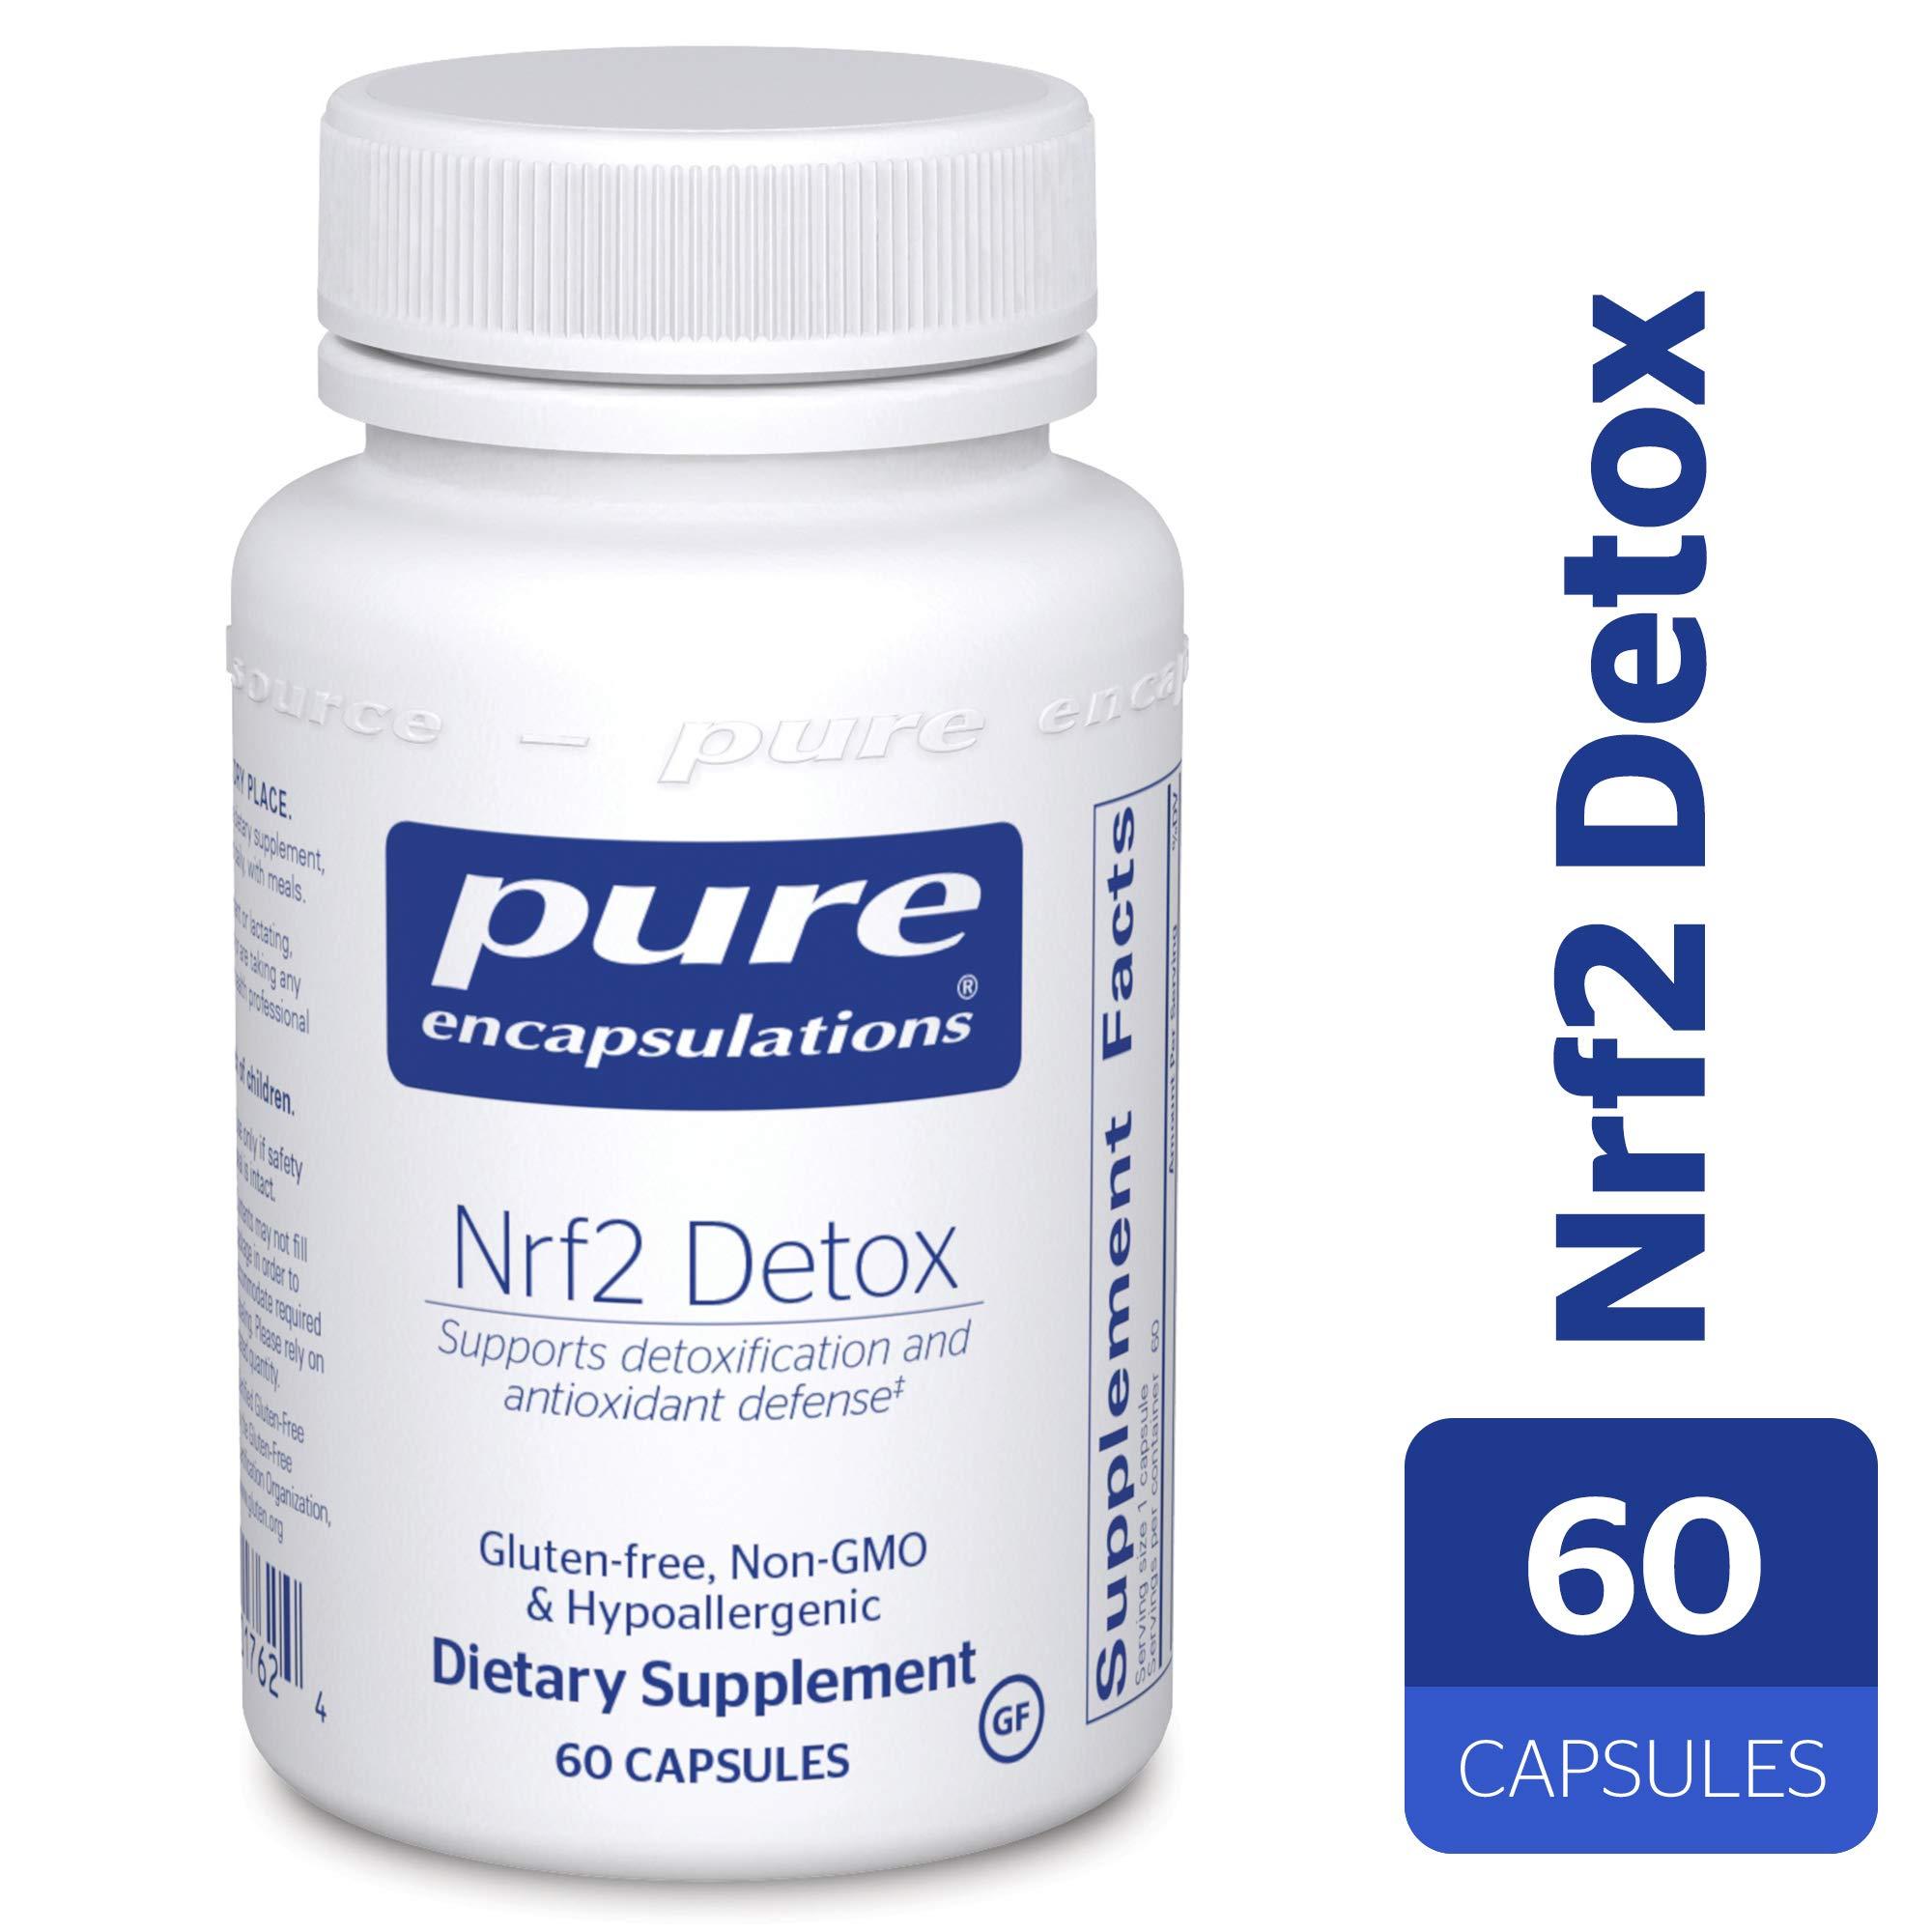 Pure Encapsulations - Nrf2 Detox - Nrf2 and Detoxification Support* - 60 Capsules